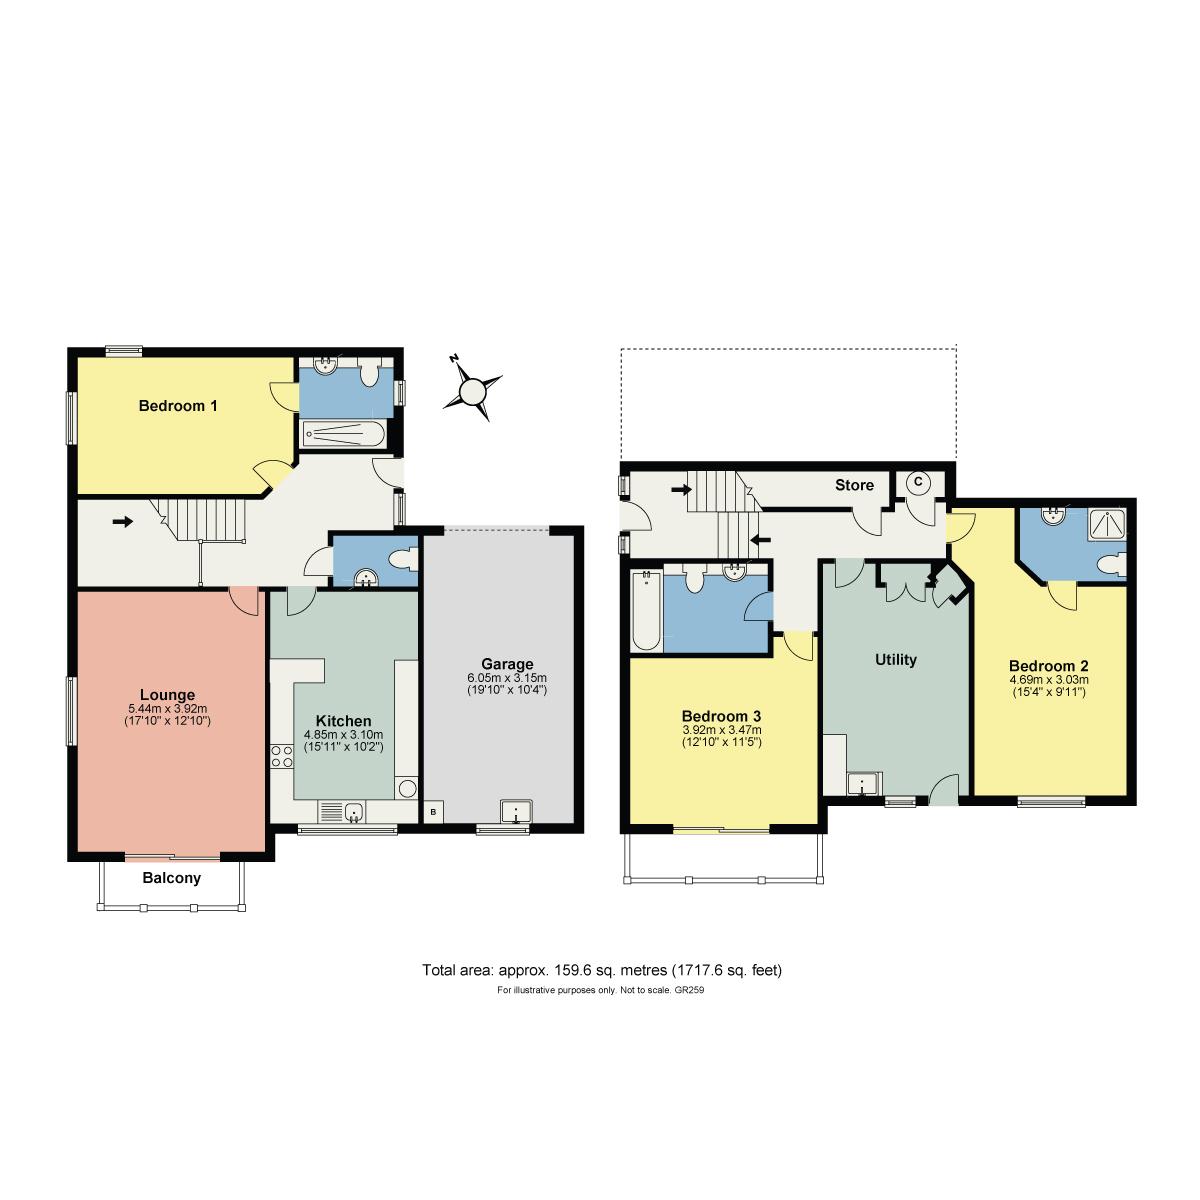 Floorplan Berry Bank House, 15 Oversands View, Grange-Over-Sands, Cumbria, LA11 7BW